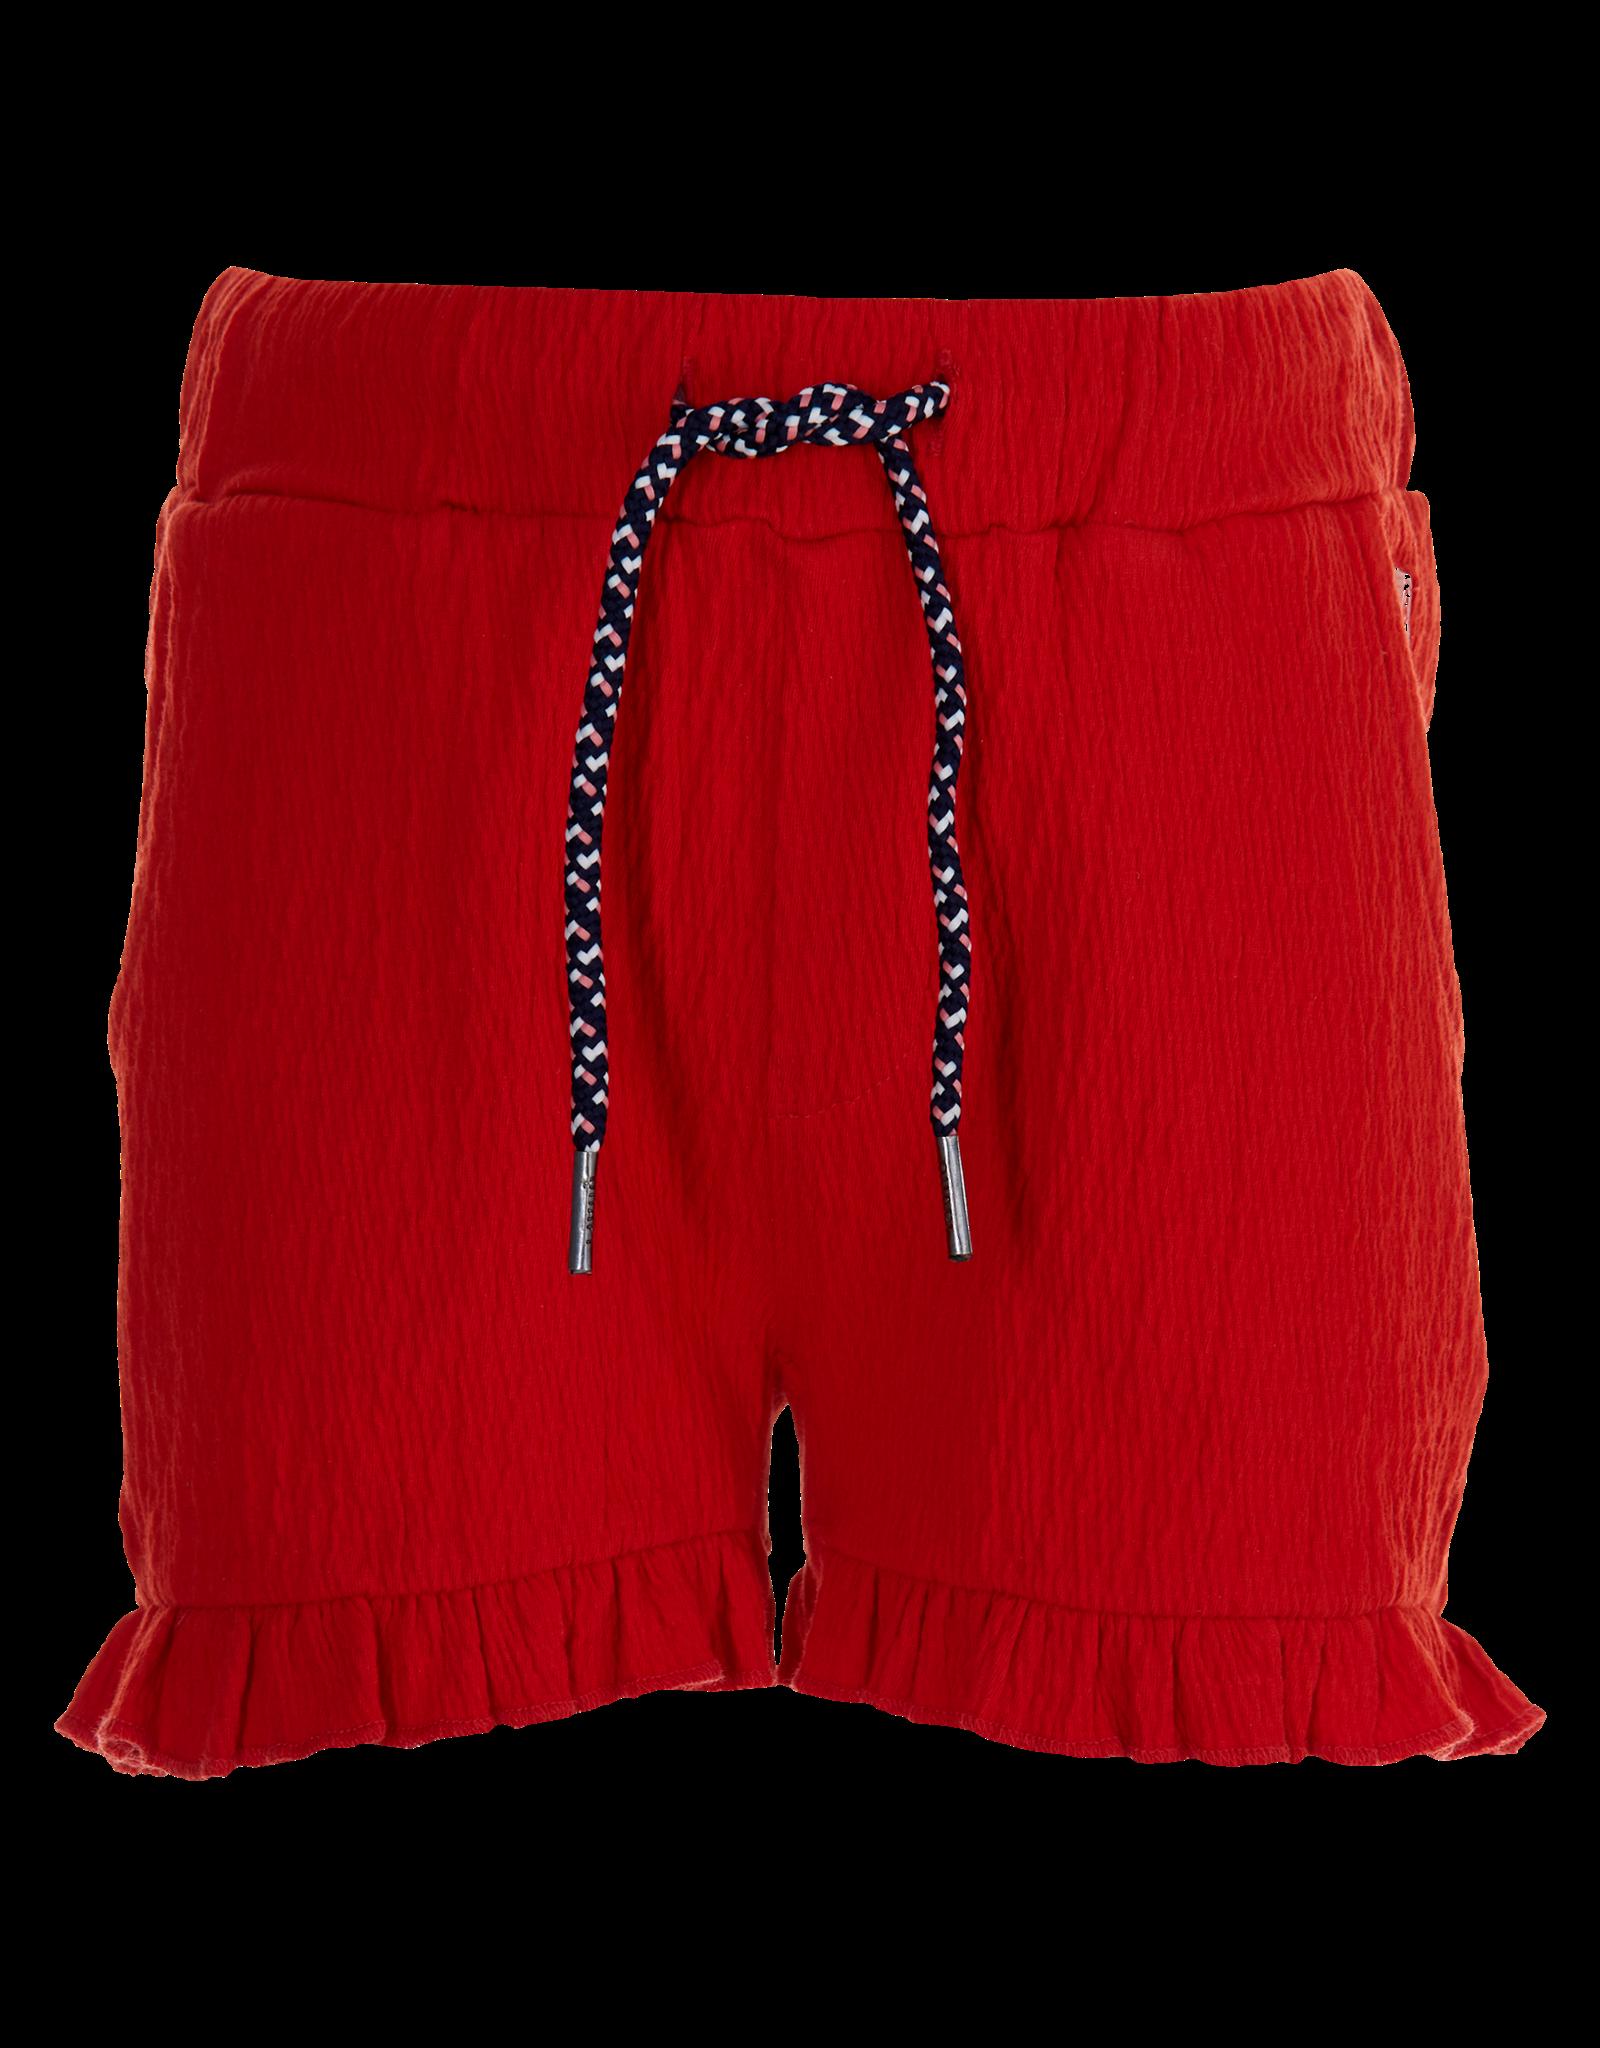 Quapi FIMKE S214 FIERY RED